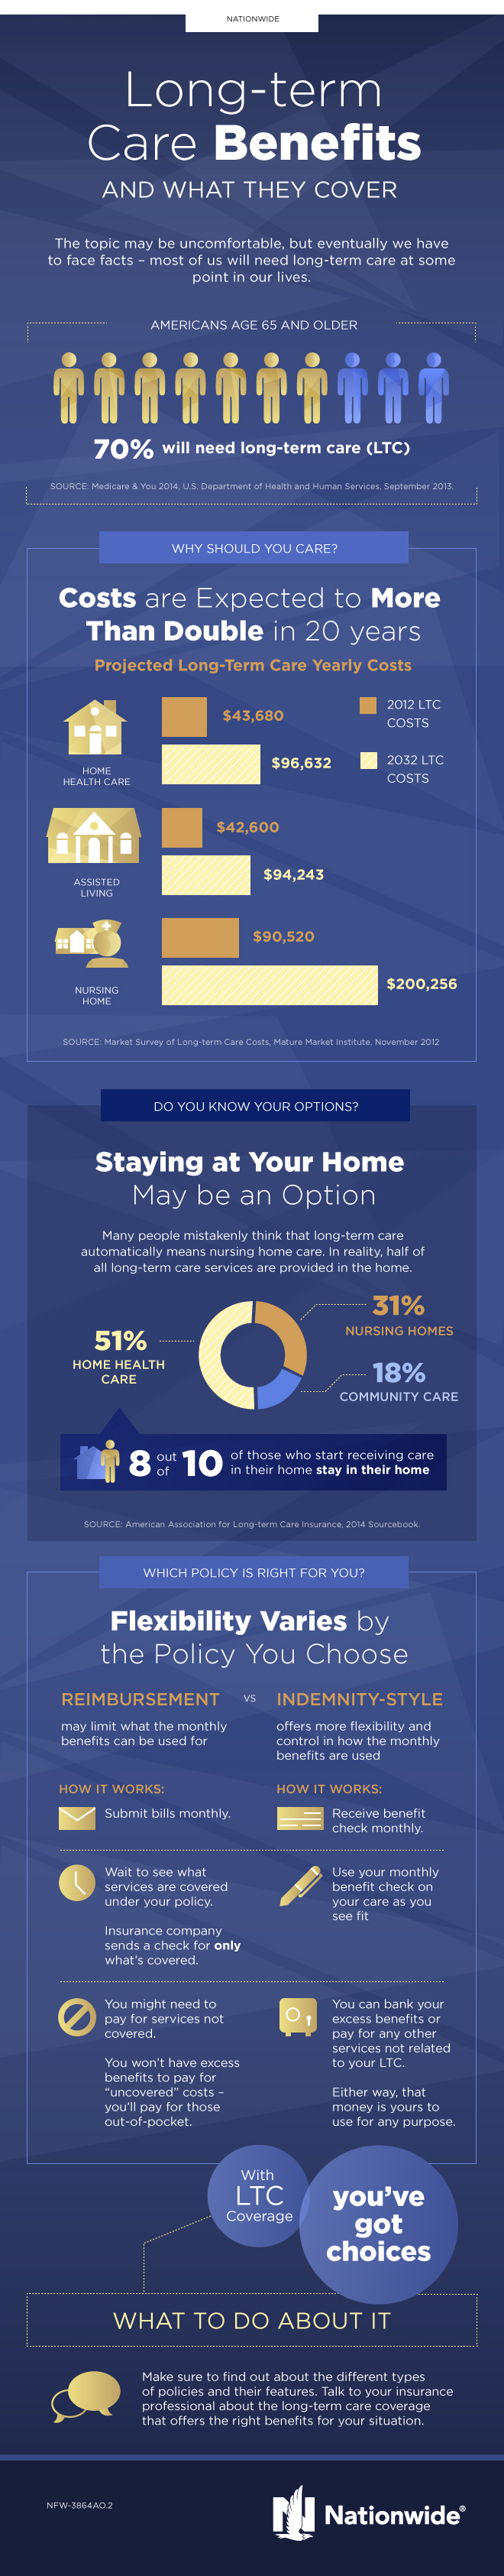 carematters-infographic.jpg